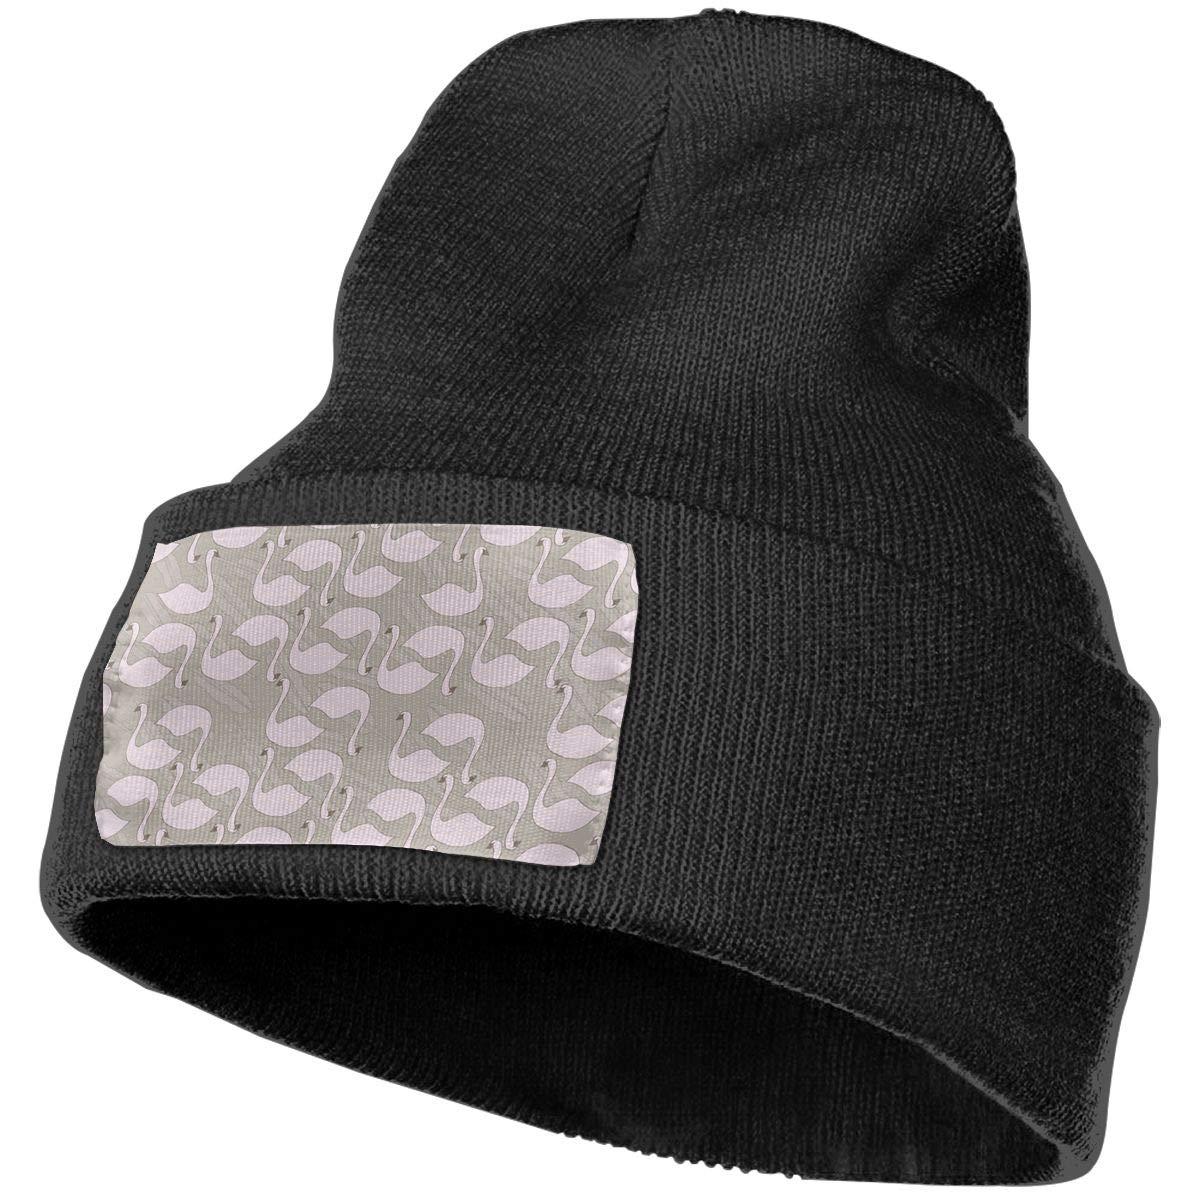 Field Rain Swan Unisex 100/% Acrylic Knit Hat Cap Rider Soft Beanie Hat Woolen Hat